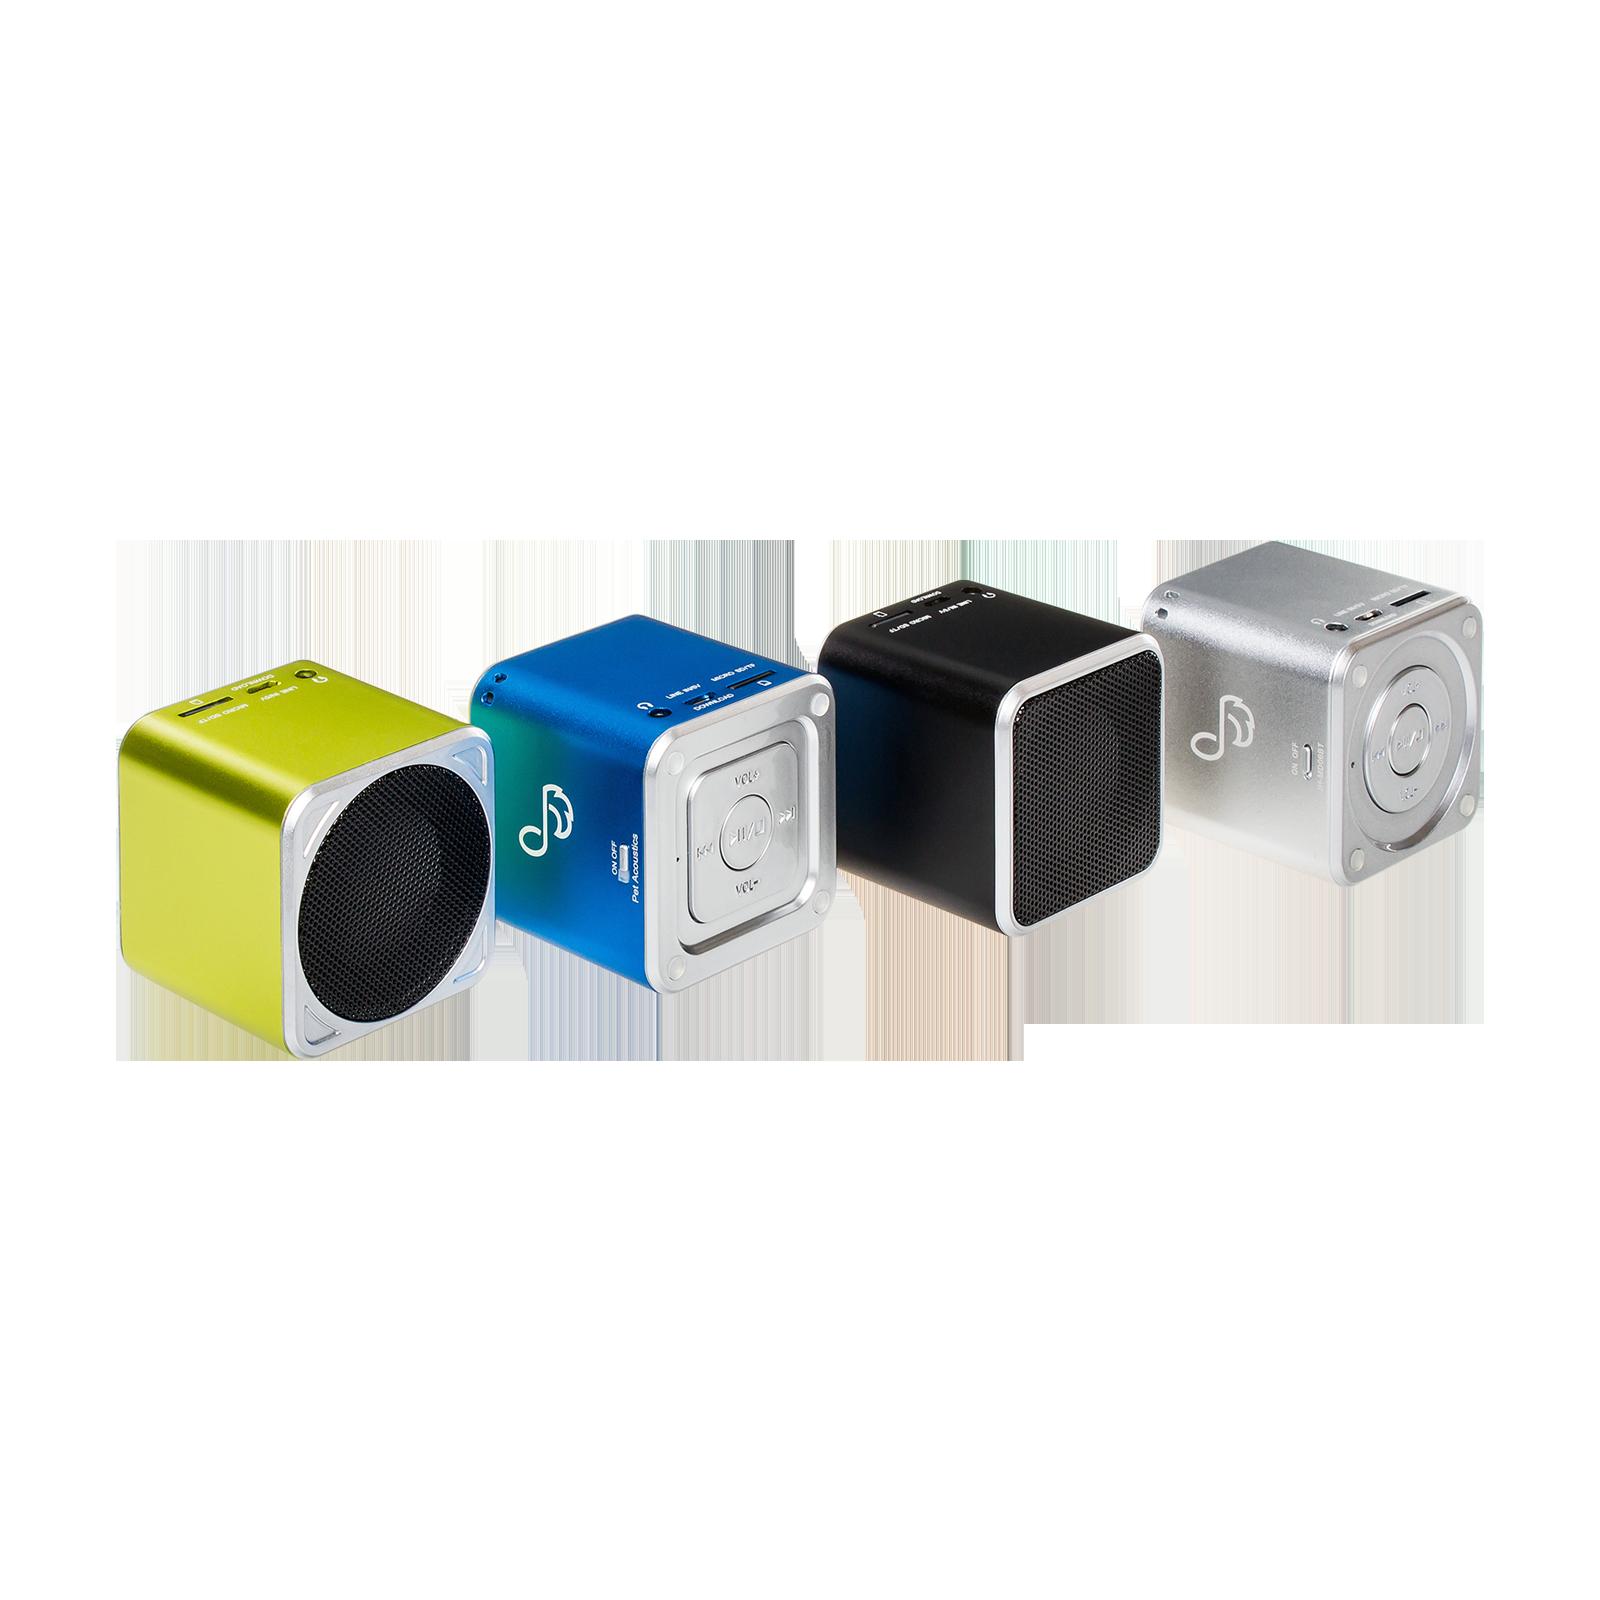 Electronics product photography